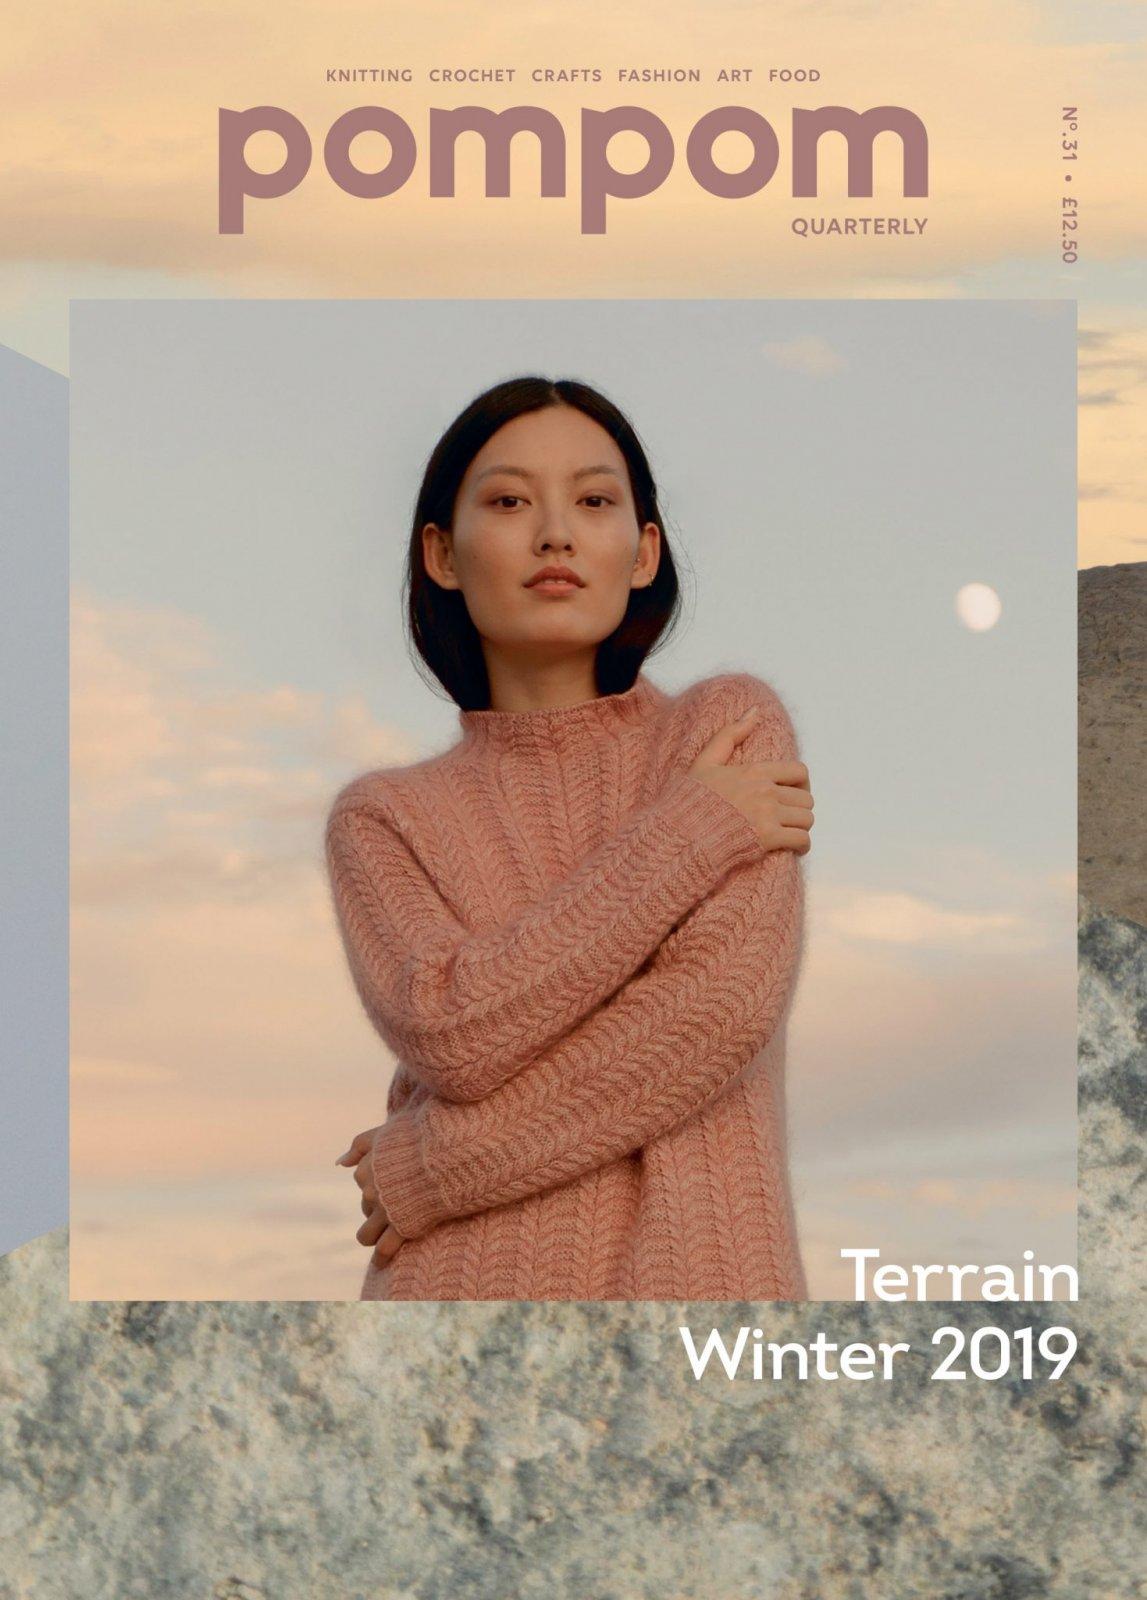 PomPom Quarterly Issue 31: Terrain Winter 2019